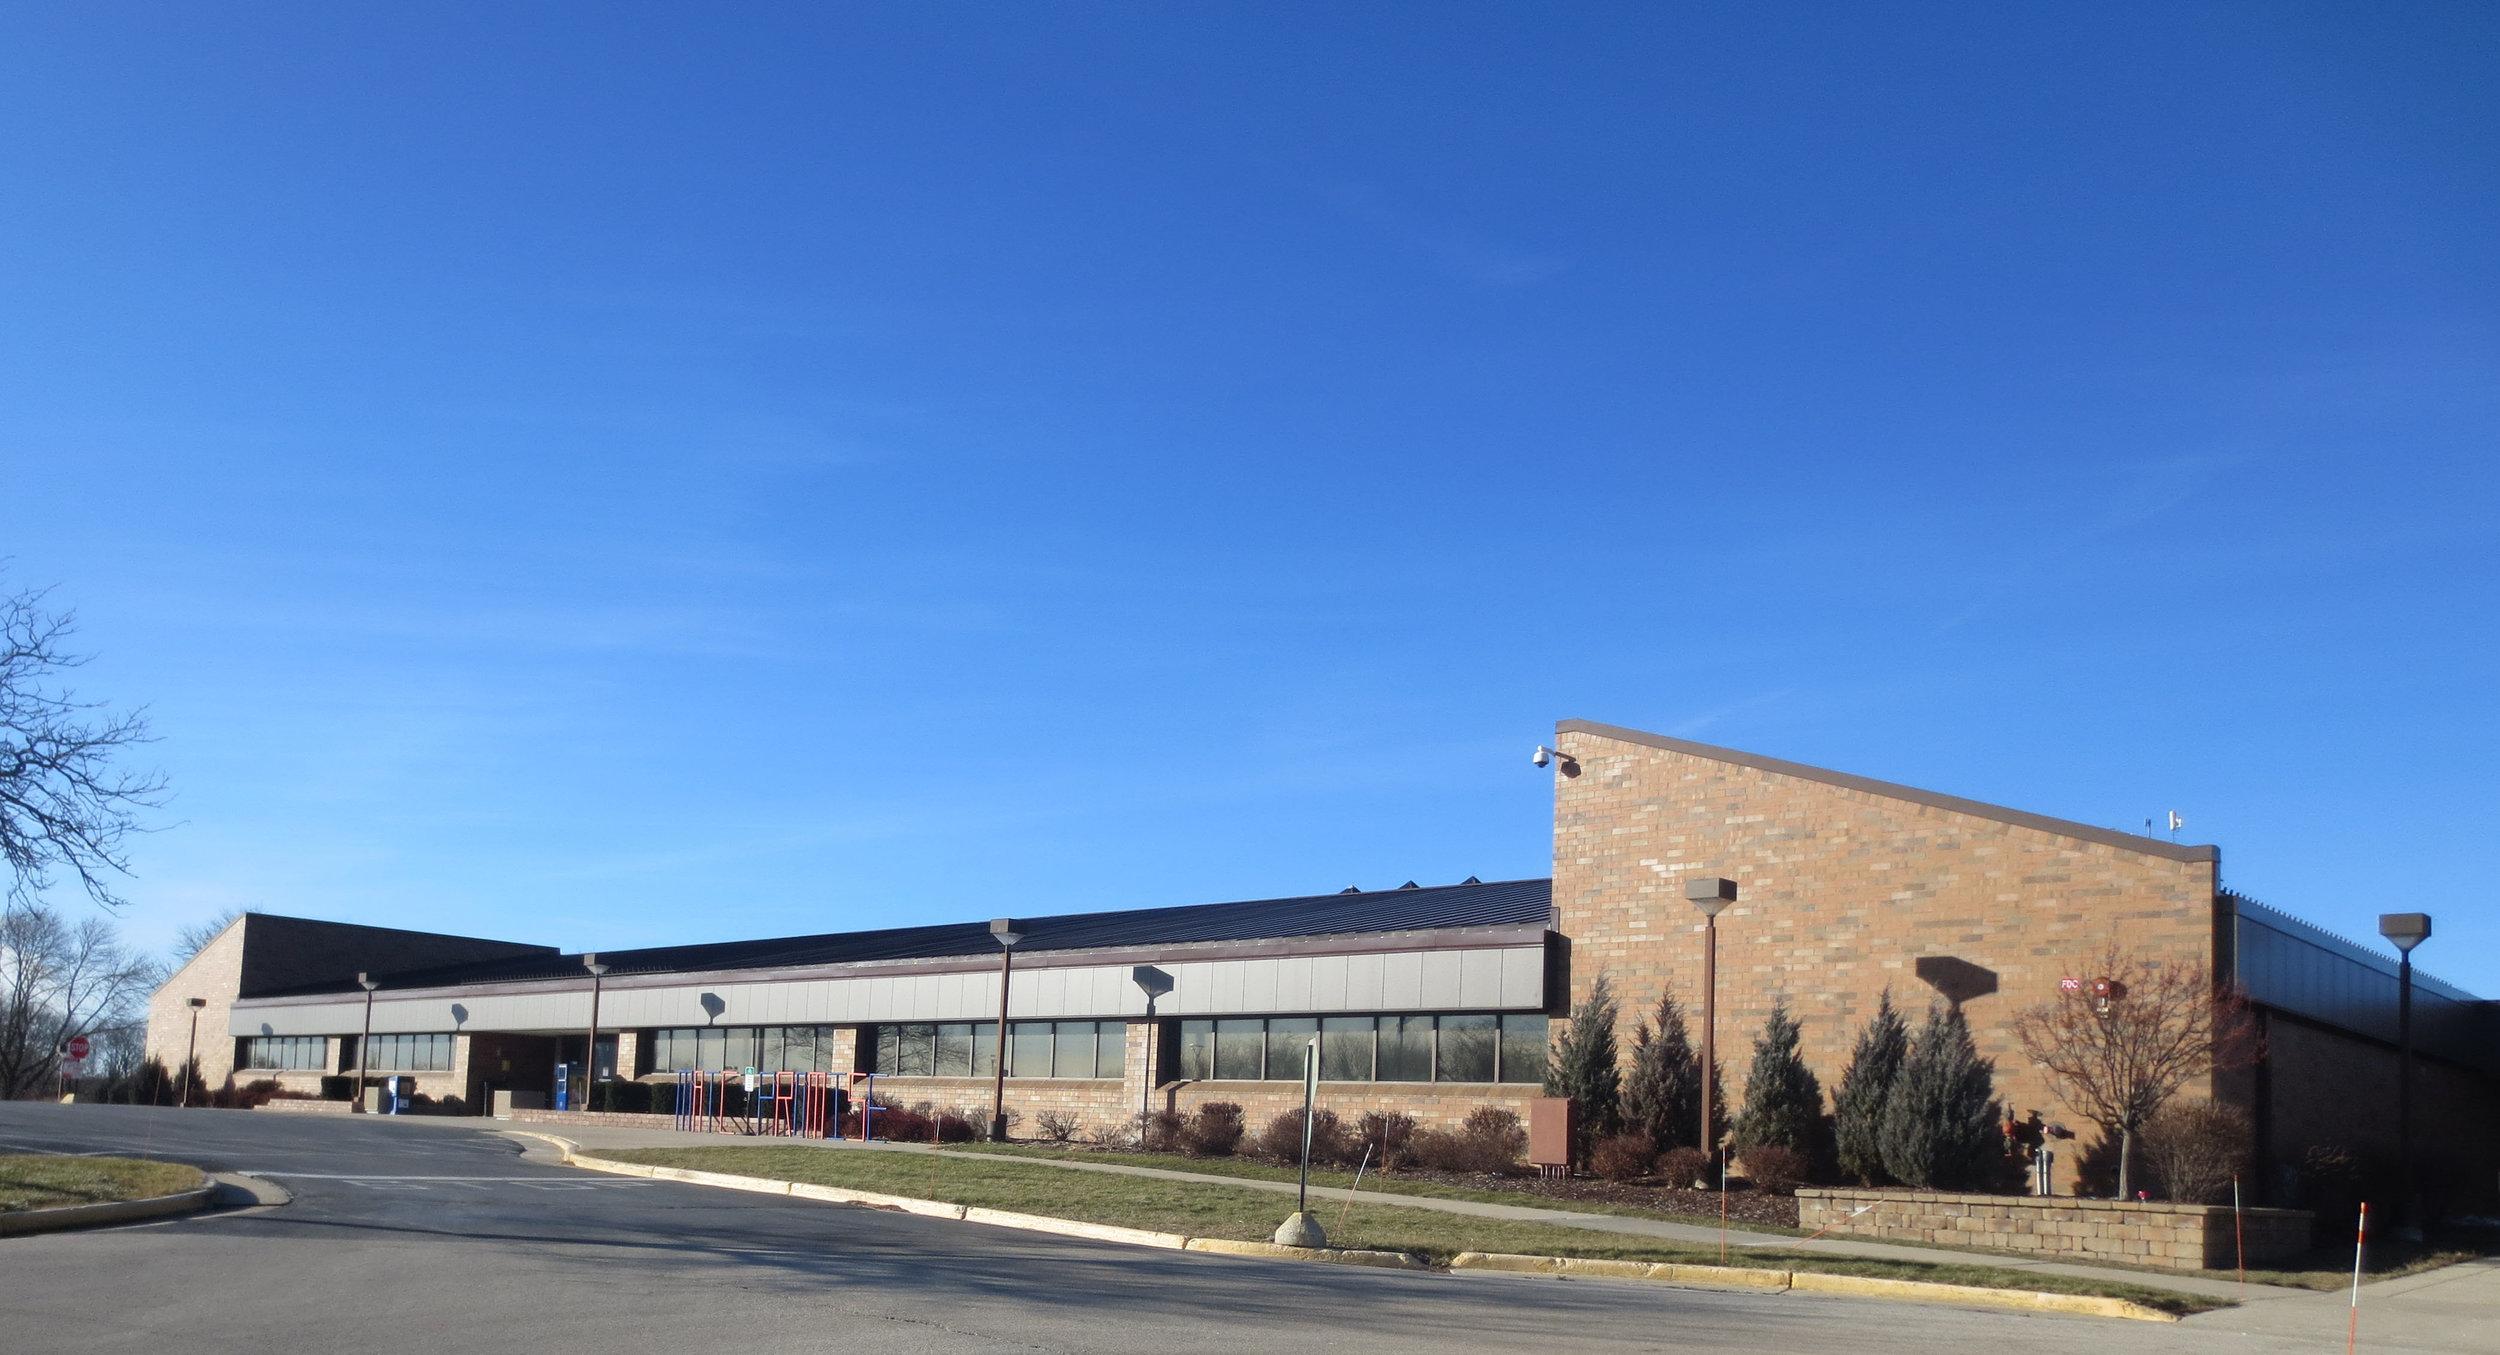 Oak Creek Campus Main Entrance Cropped.jpg